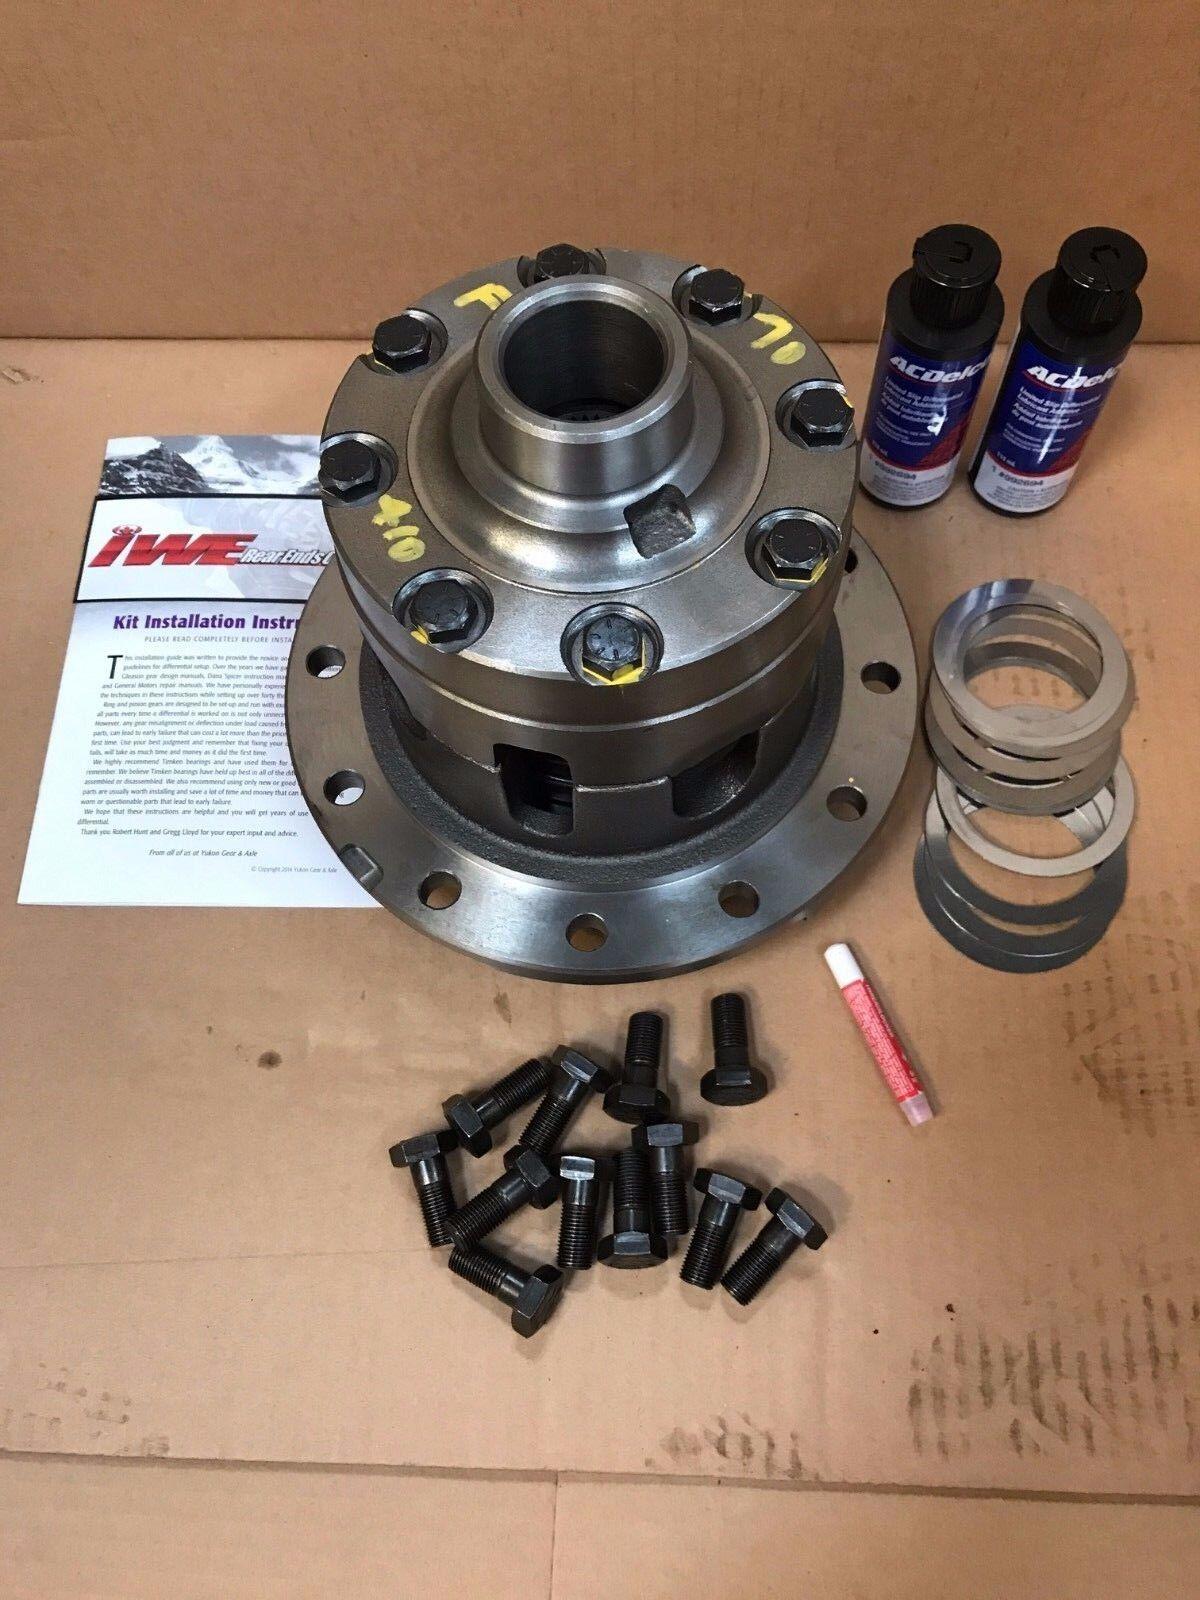 Details about DANA 70 U POWER LOCK POSI LIMITED SLIP 32 SPL NEW DODGE 2500  CHEVY FORD F350 4X4